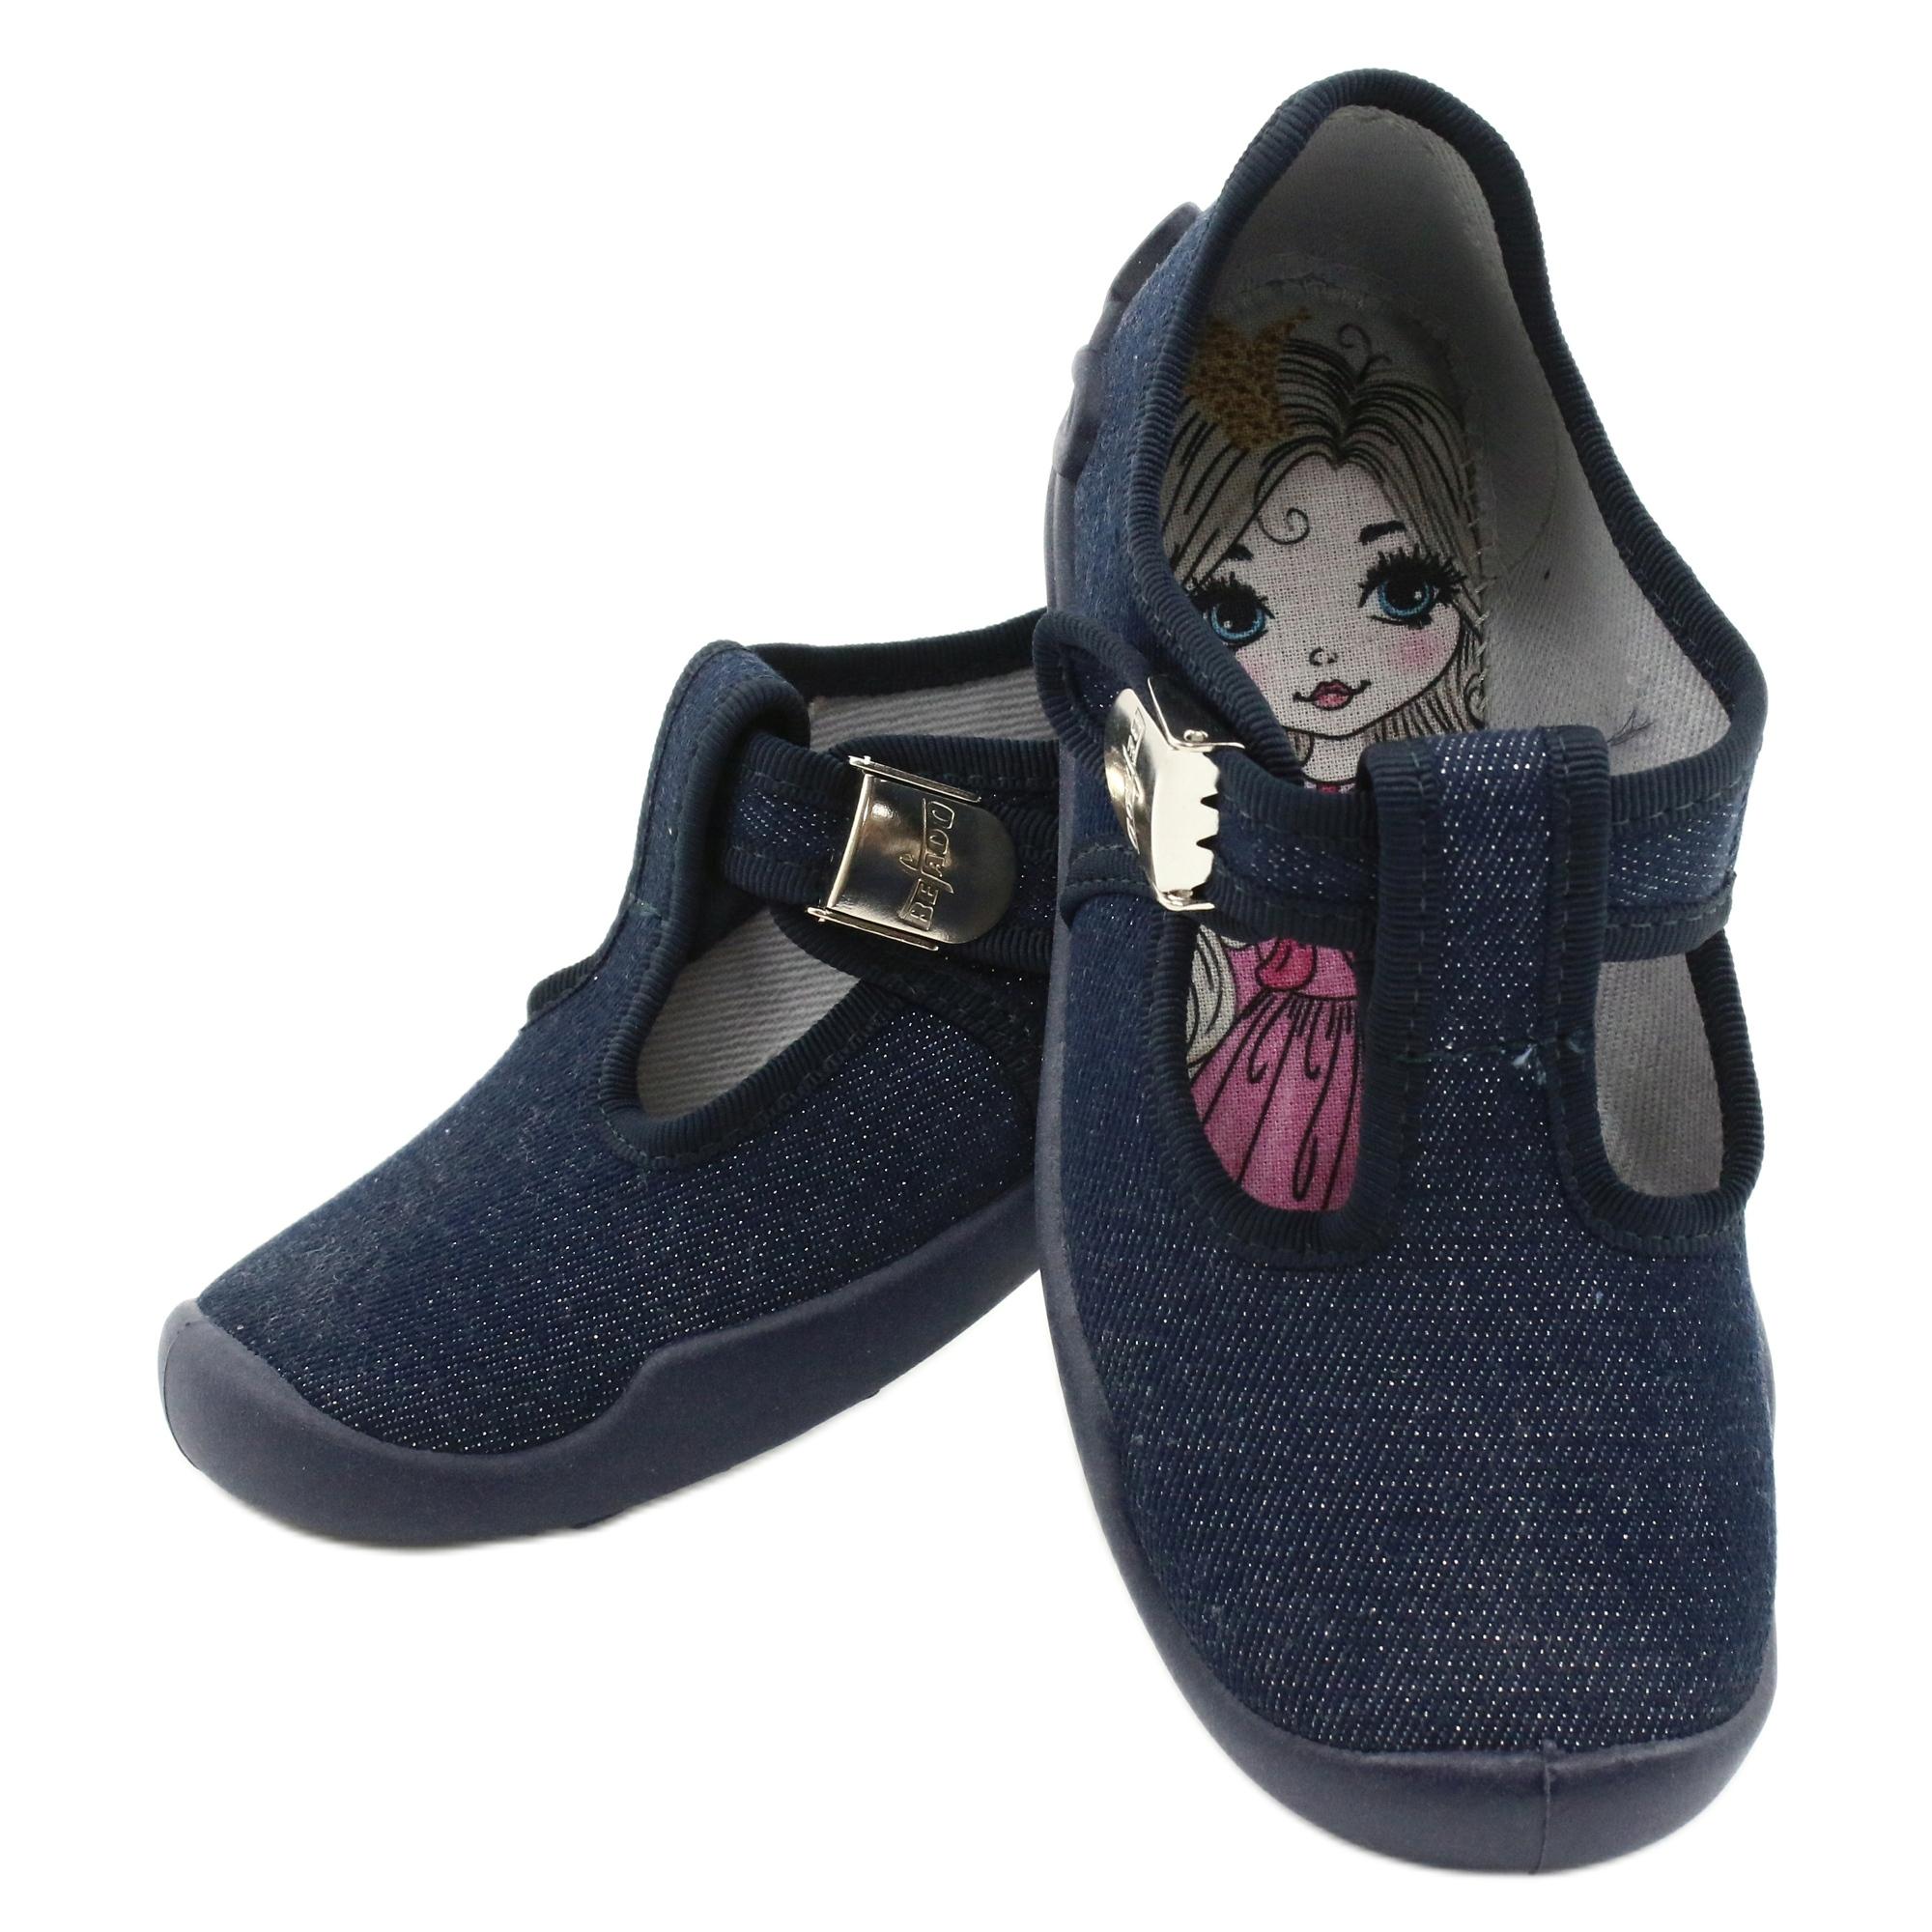 miniatura 7 - Scarpe per bambini Befado in bianco blu navy